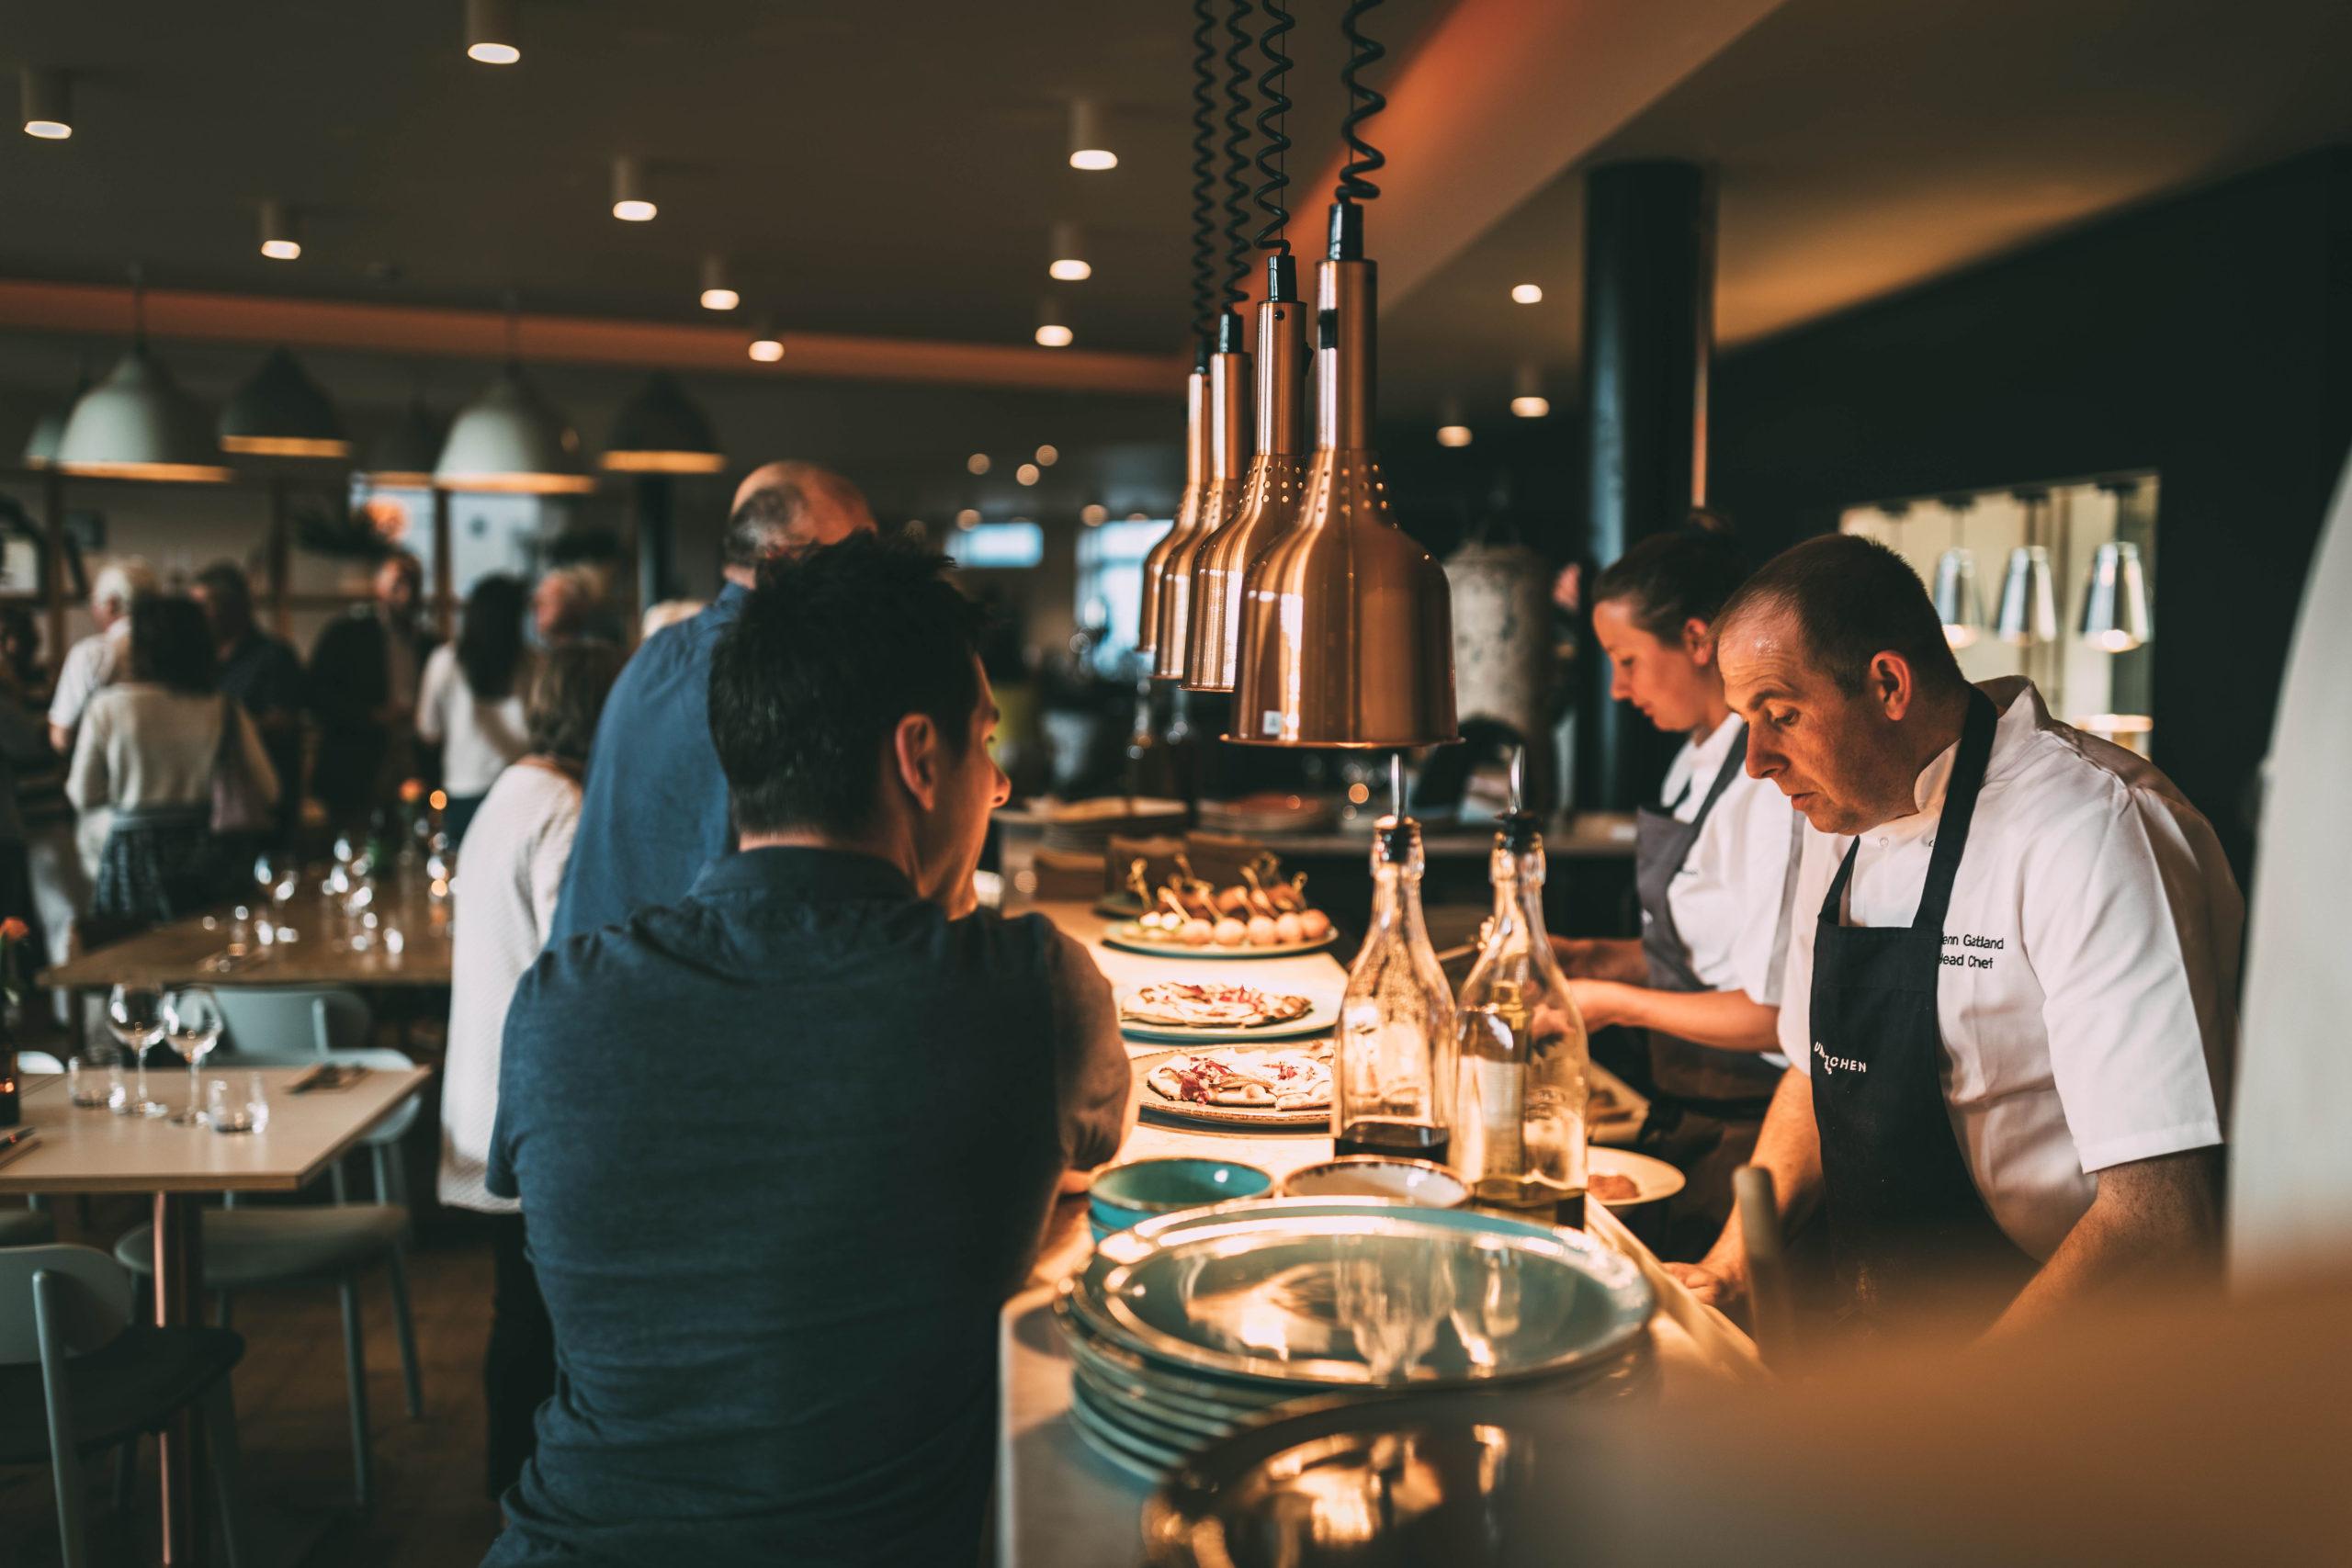 Glenn Gatland, head chef at Una Kitchen